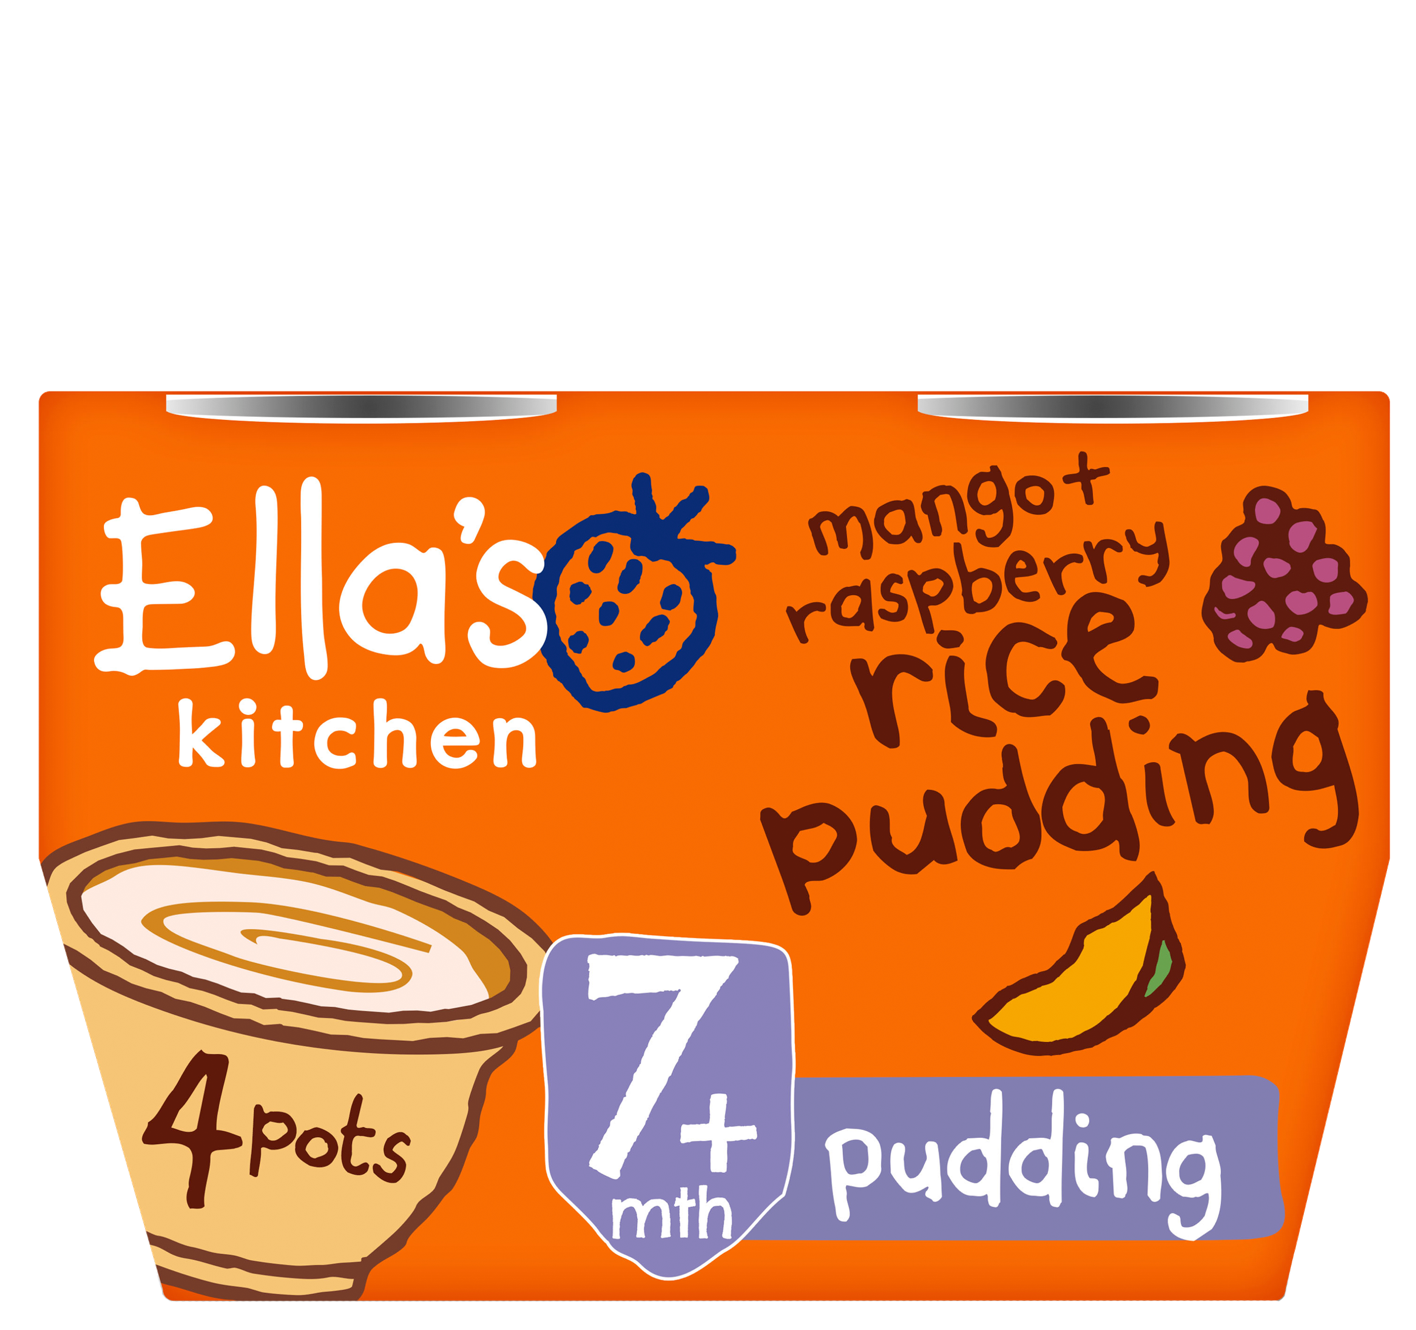 Mango raspberry rice pudding front